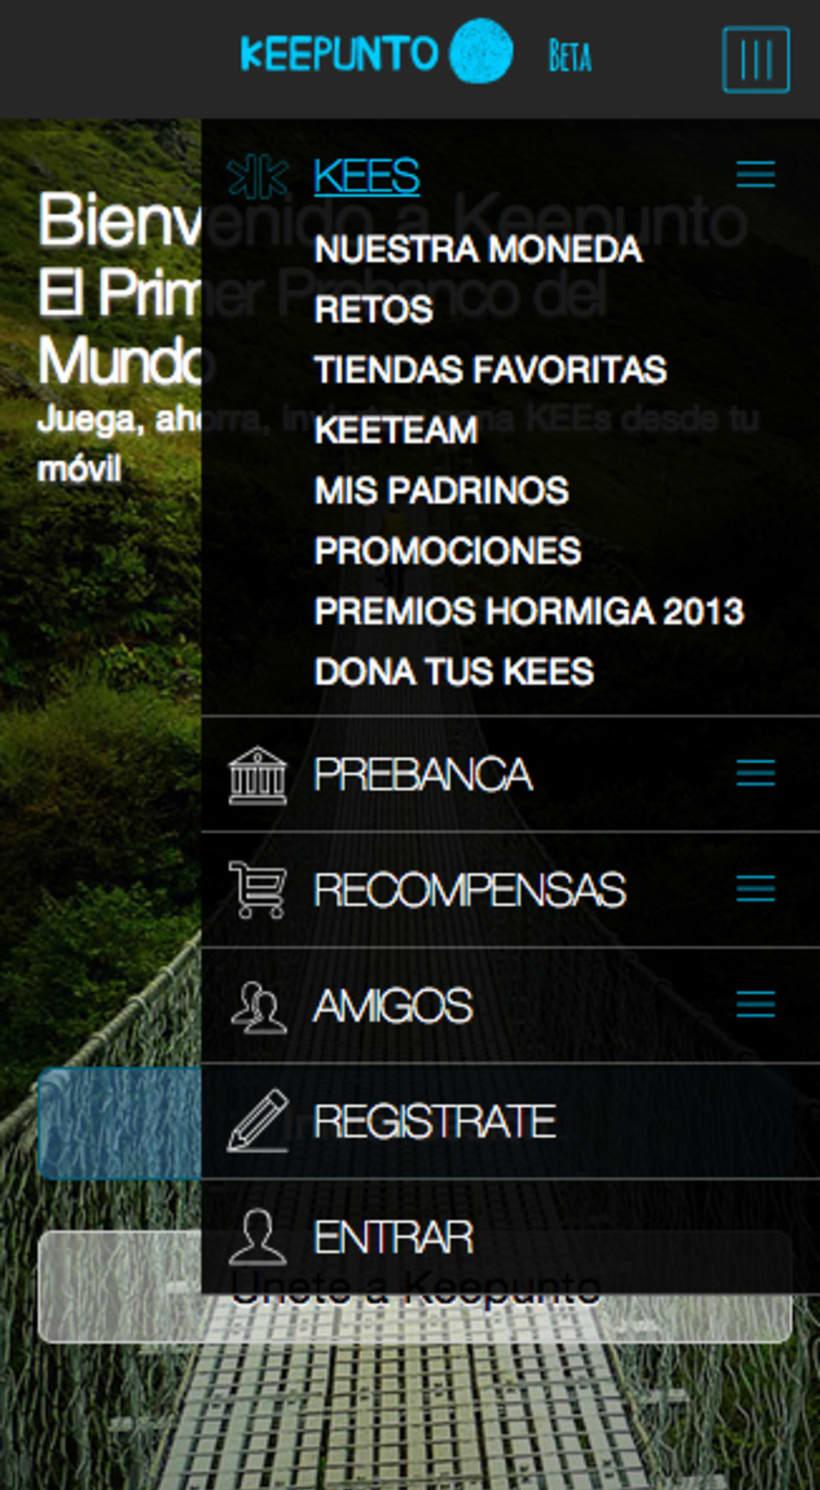 Keepunto Diseño Movil (web mobile) 3